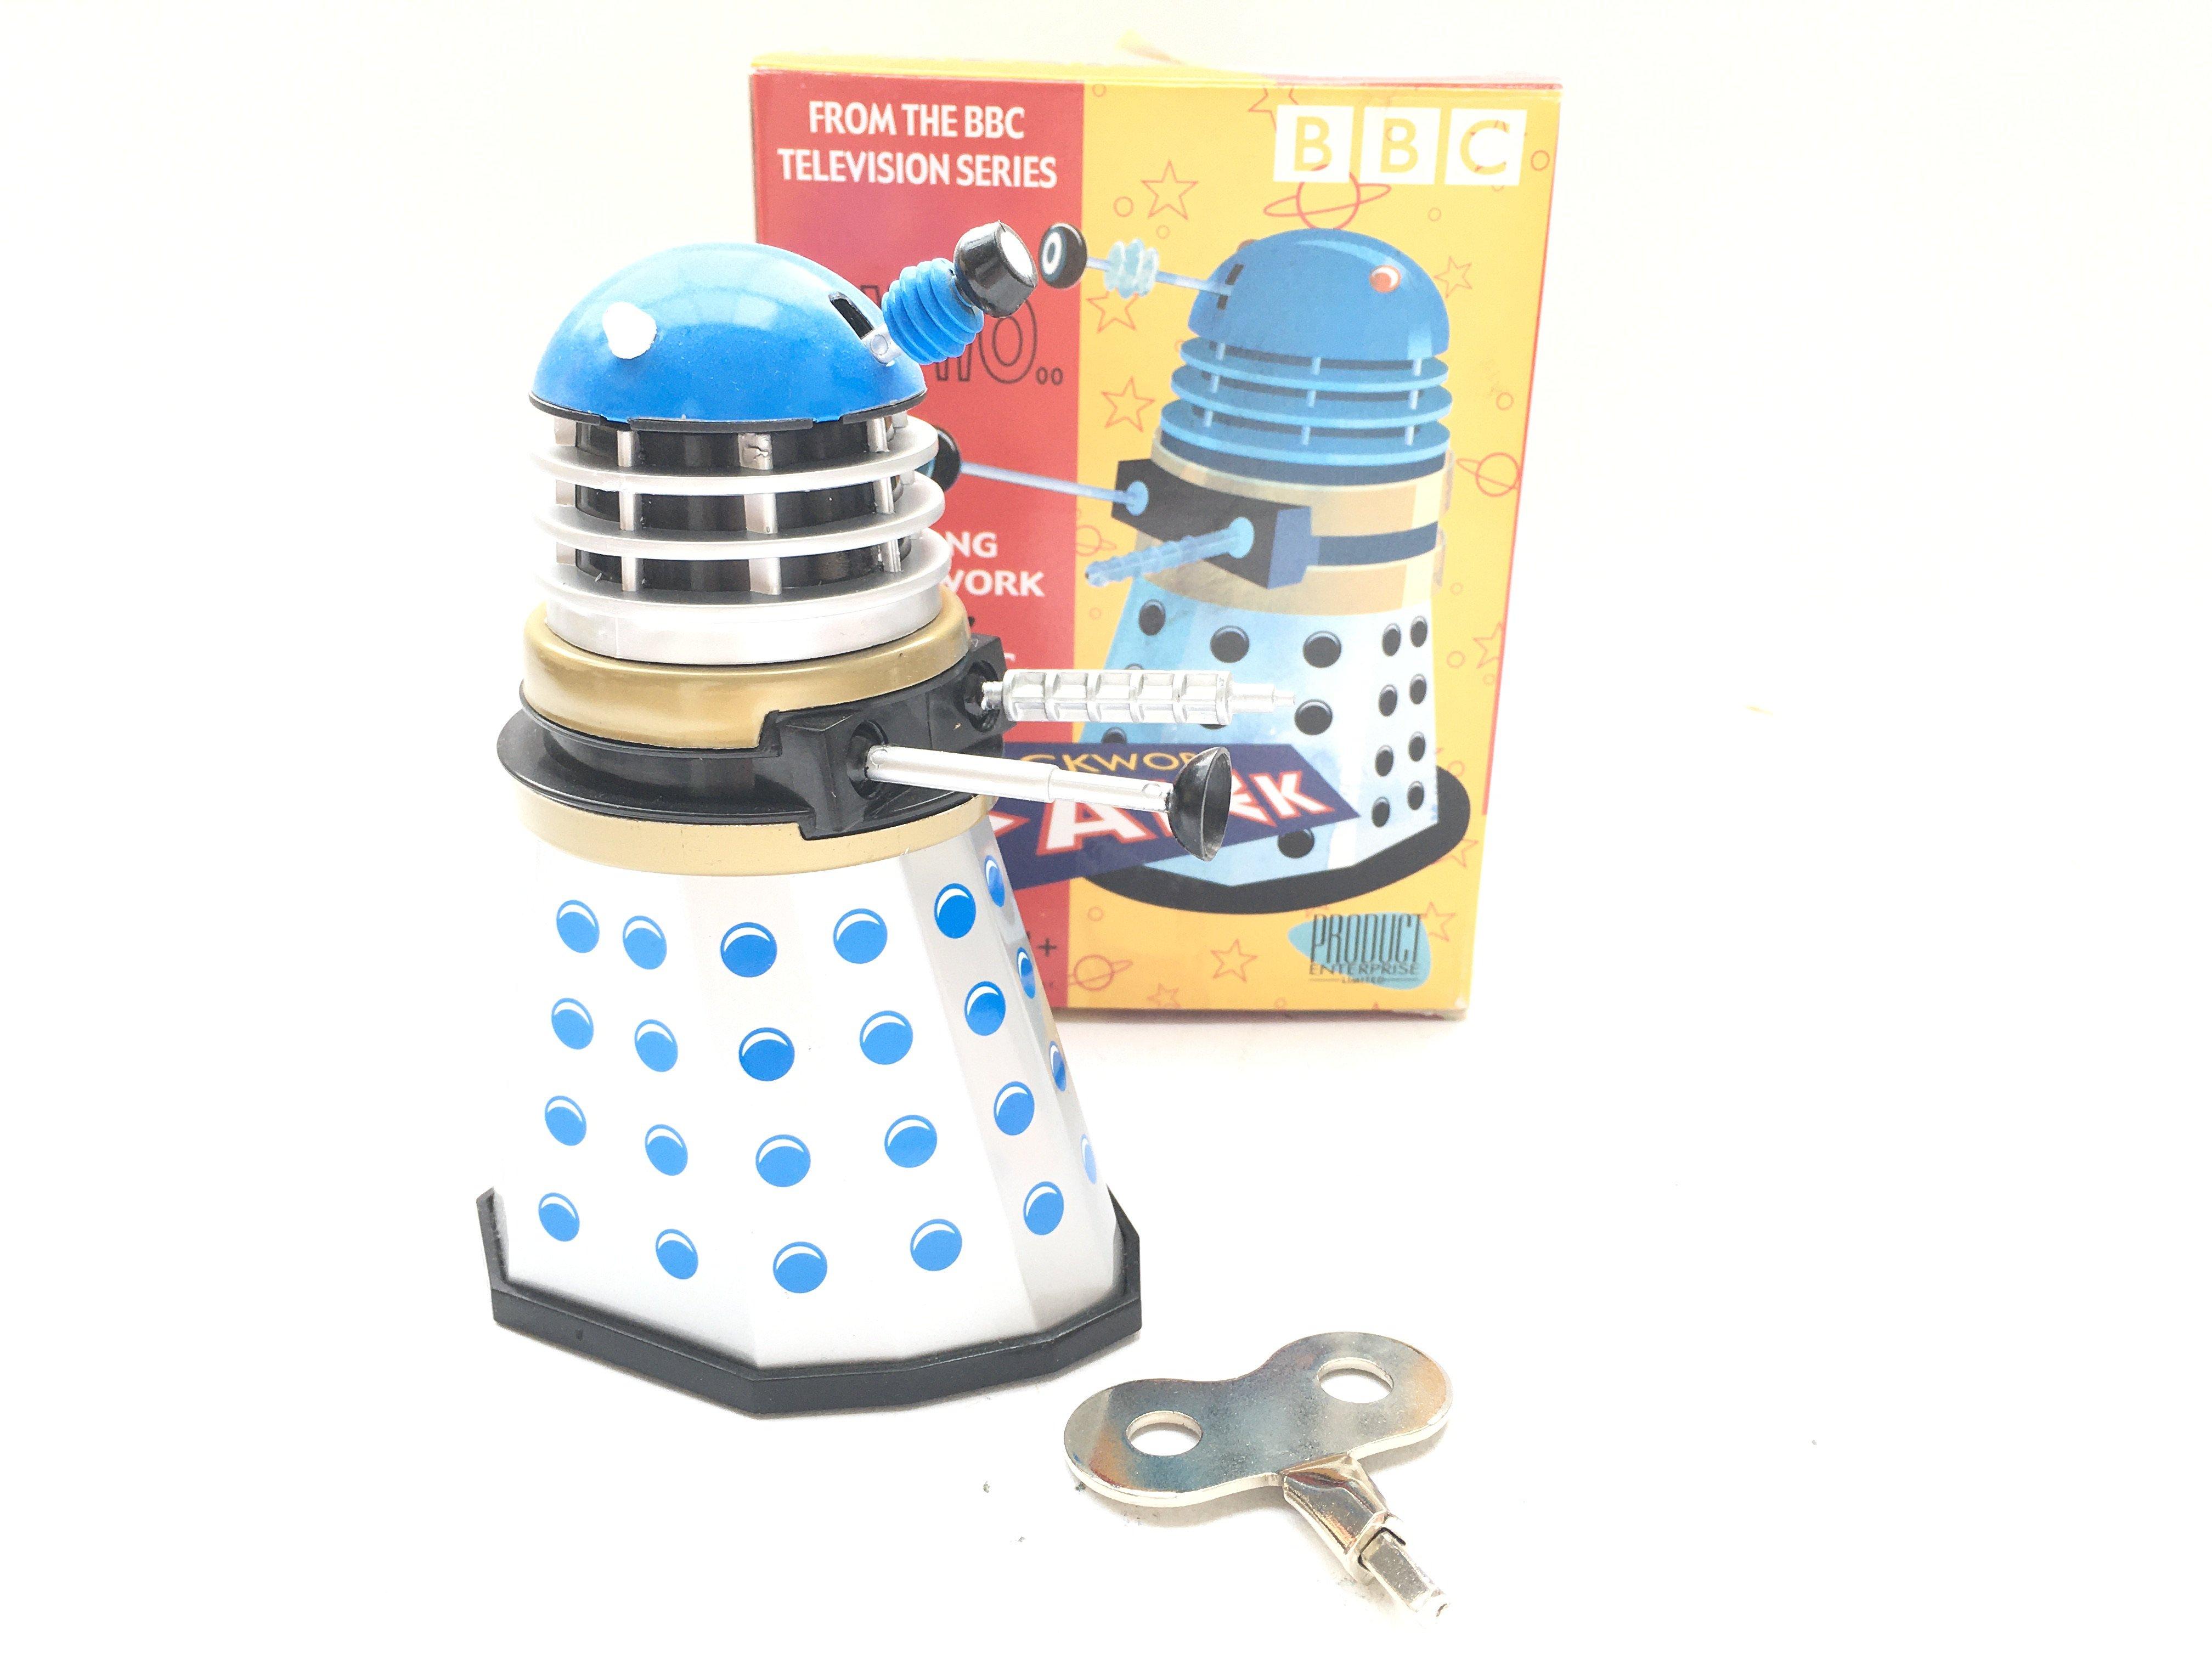 A Doctor Who Product Enterprise Limited Clockwork